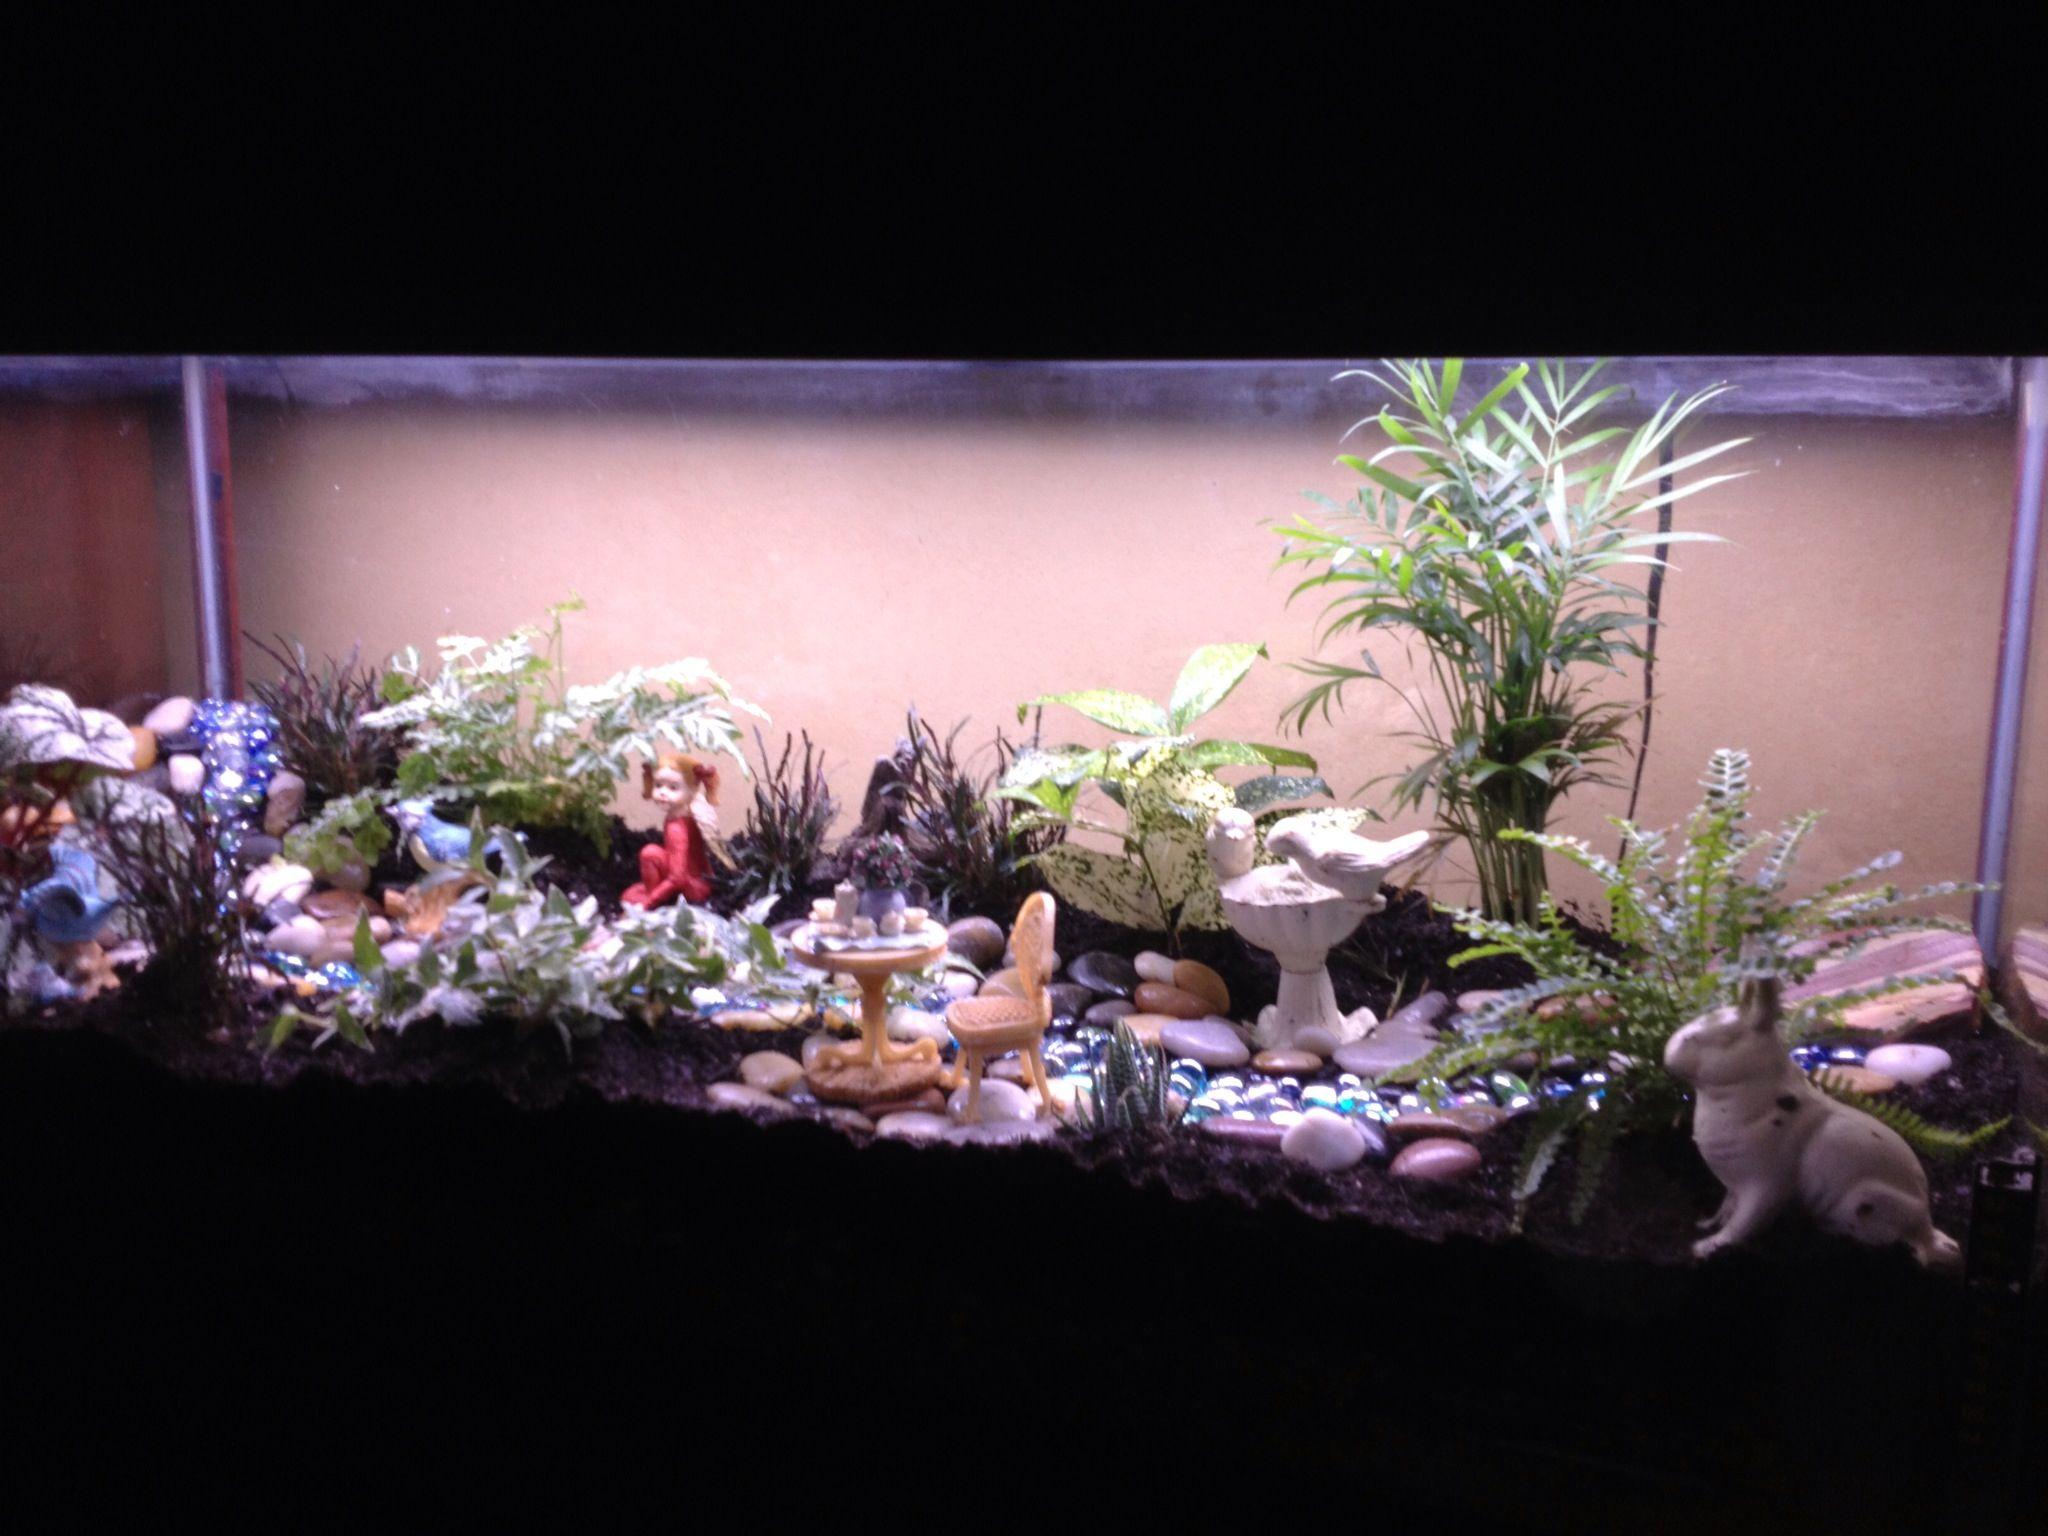 I did it turned my gallon aquarium into a terrariumfairy garden